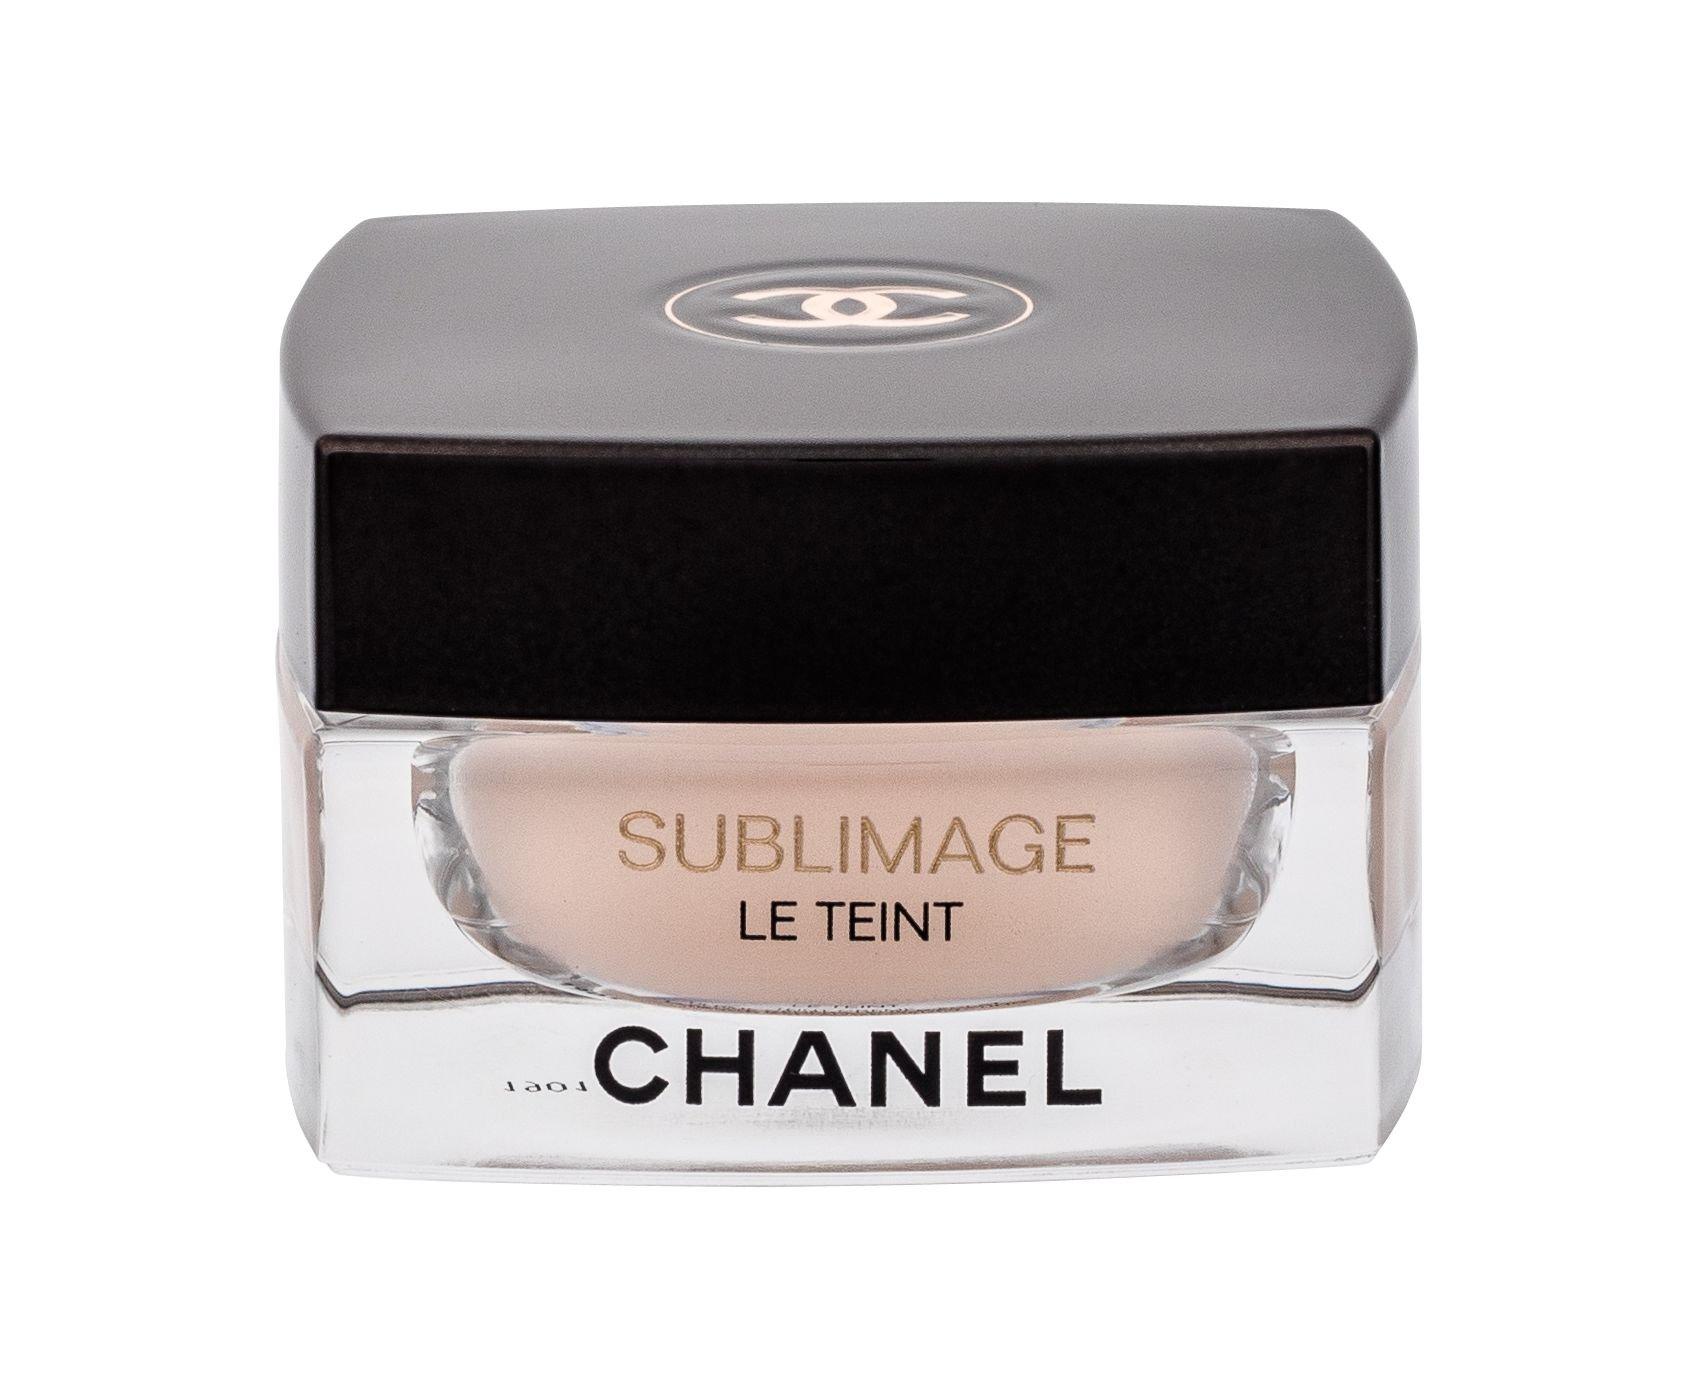 Chanel Sublimage Makeup 30ml 10 Beige